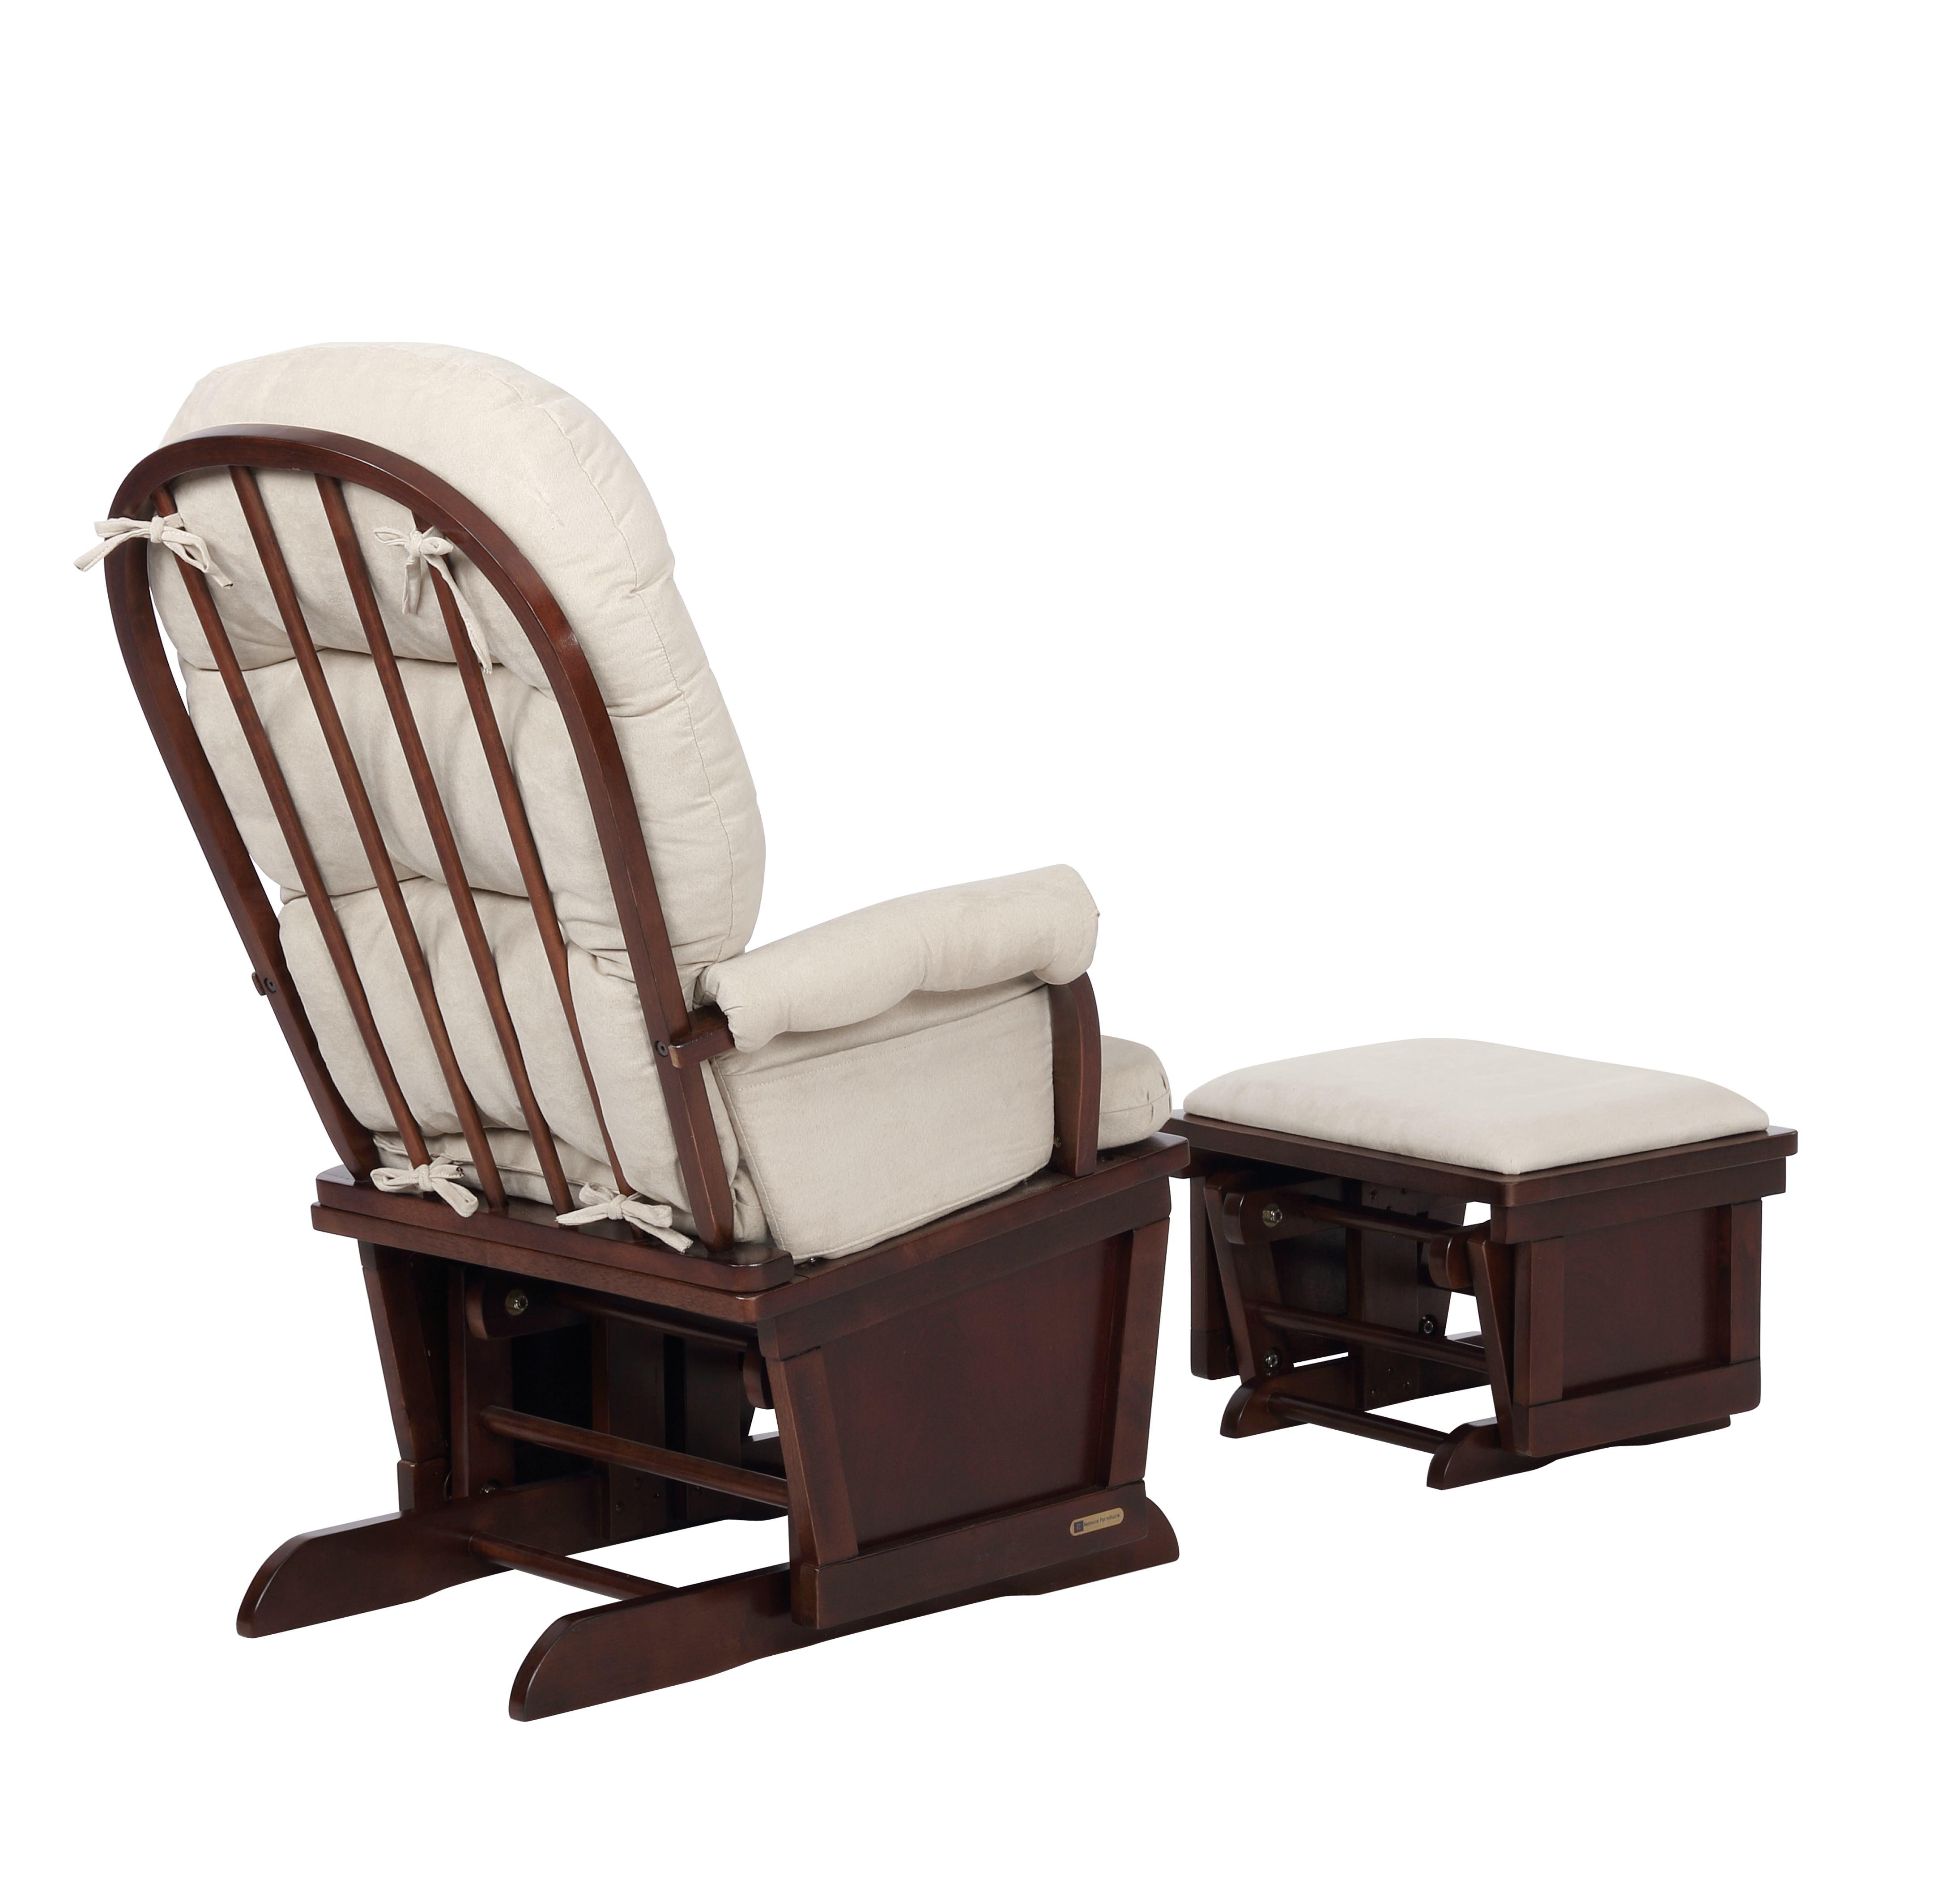 Glider Chair And Ottoman Set Espresso Beige 7580cb 02 0182